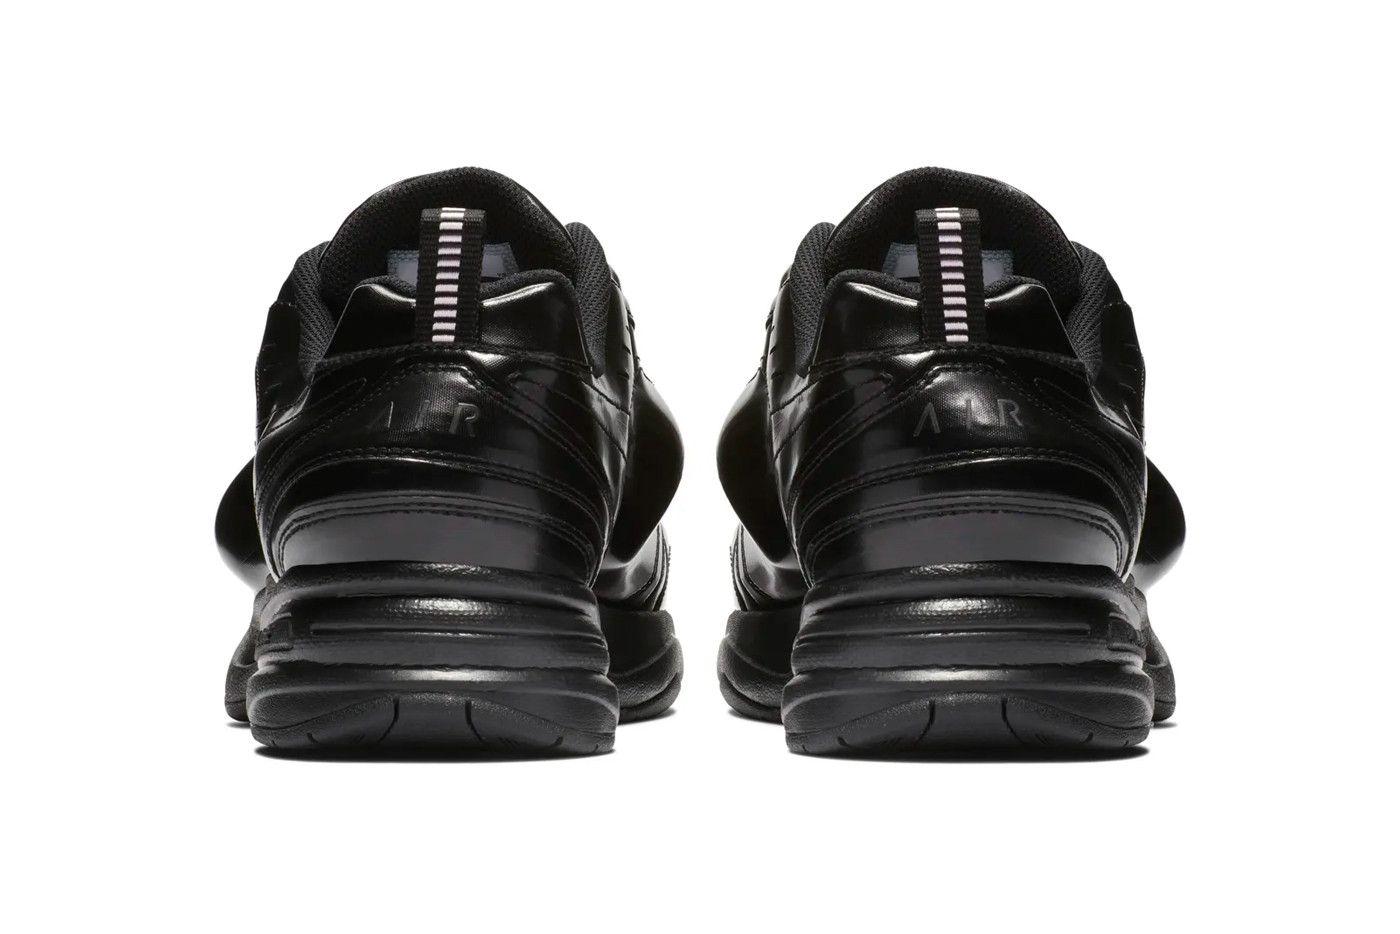 Nike ISPA Air Max 270 SP SOE Black Anthracite BQ1918-002 Release Date Price   0bbf73ad6